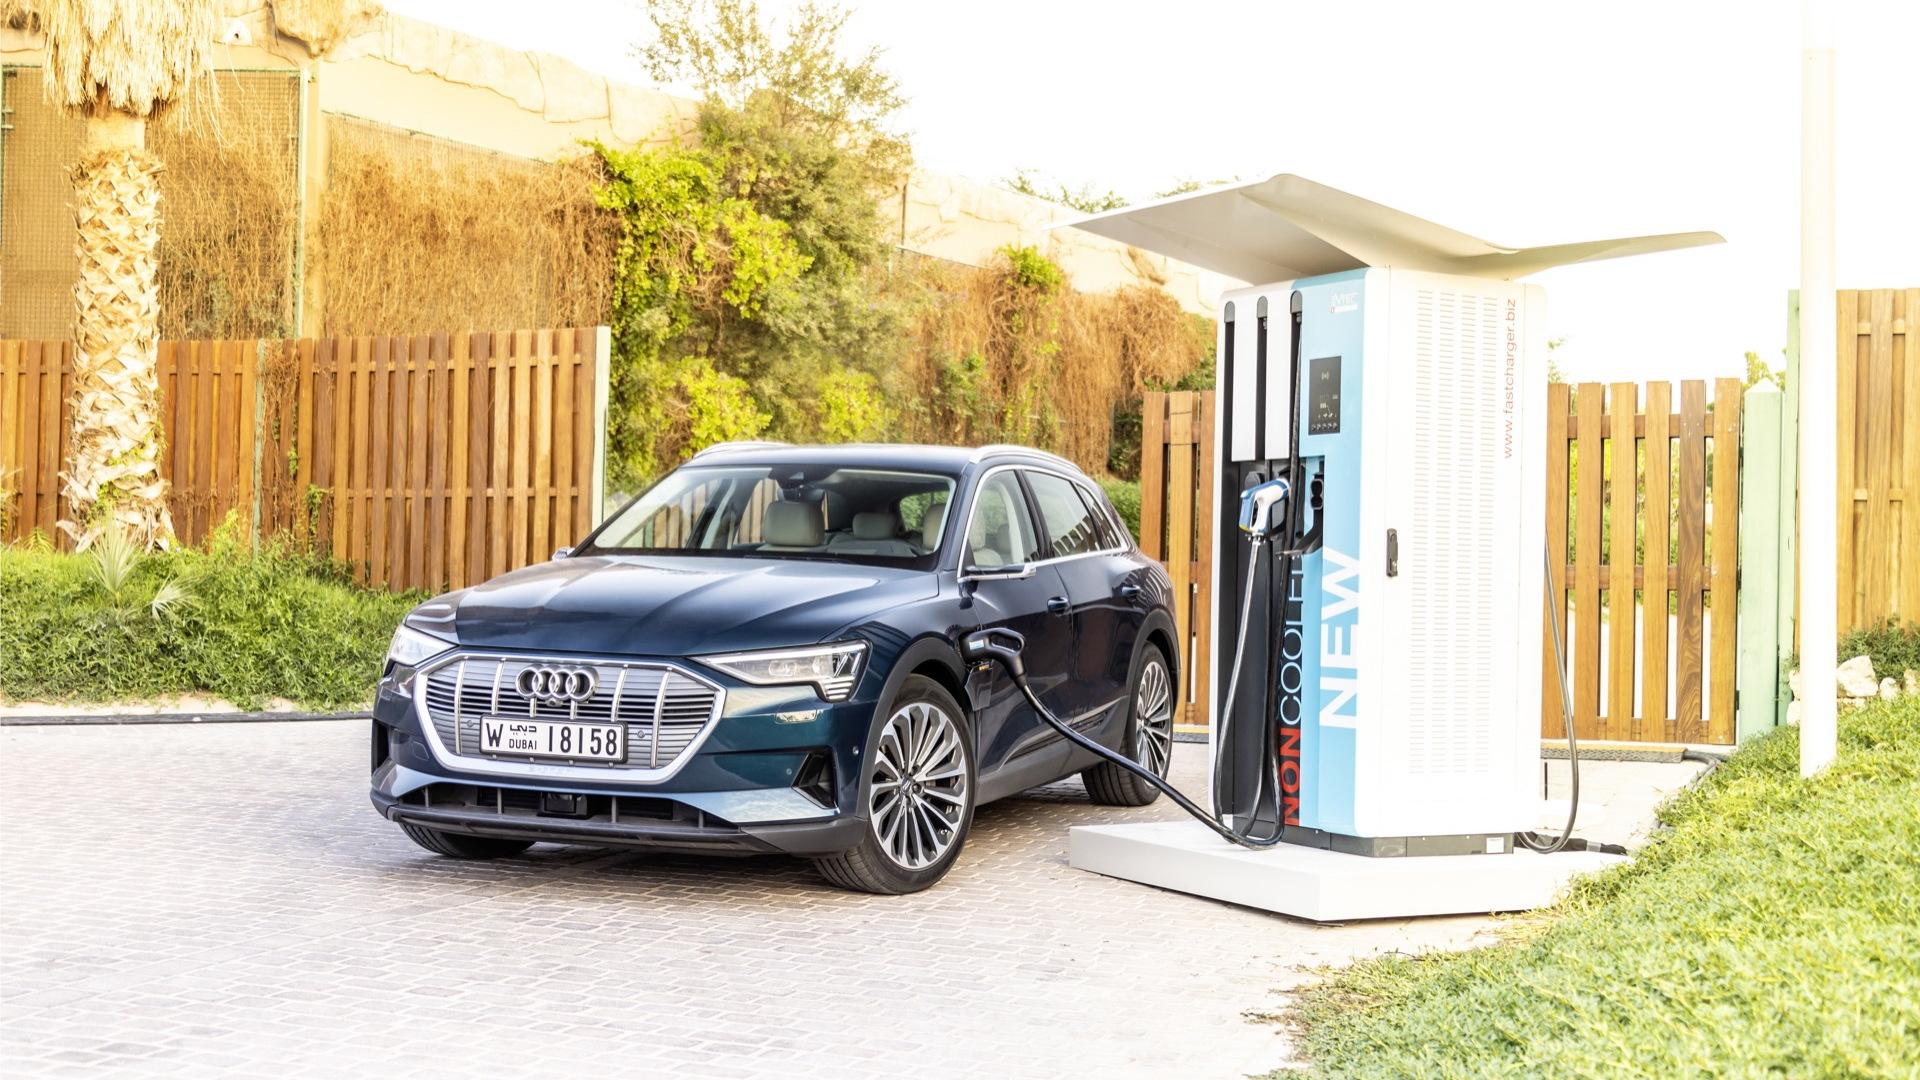 2019 Audi e-tron first drive  -  Abu Dhabi UAE, December 2018